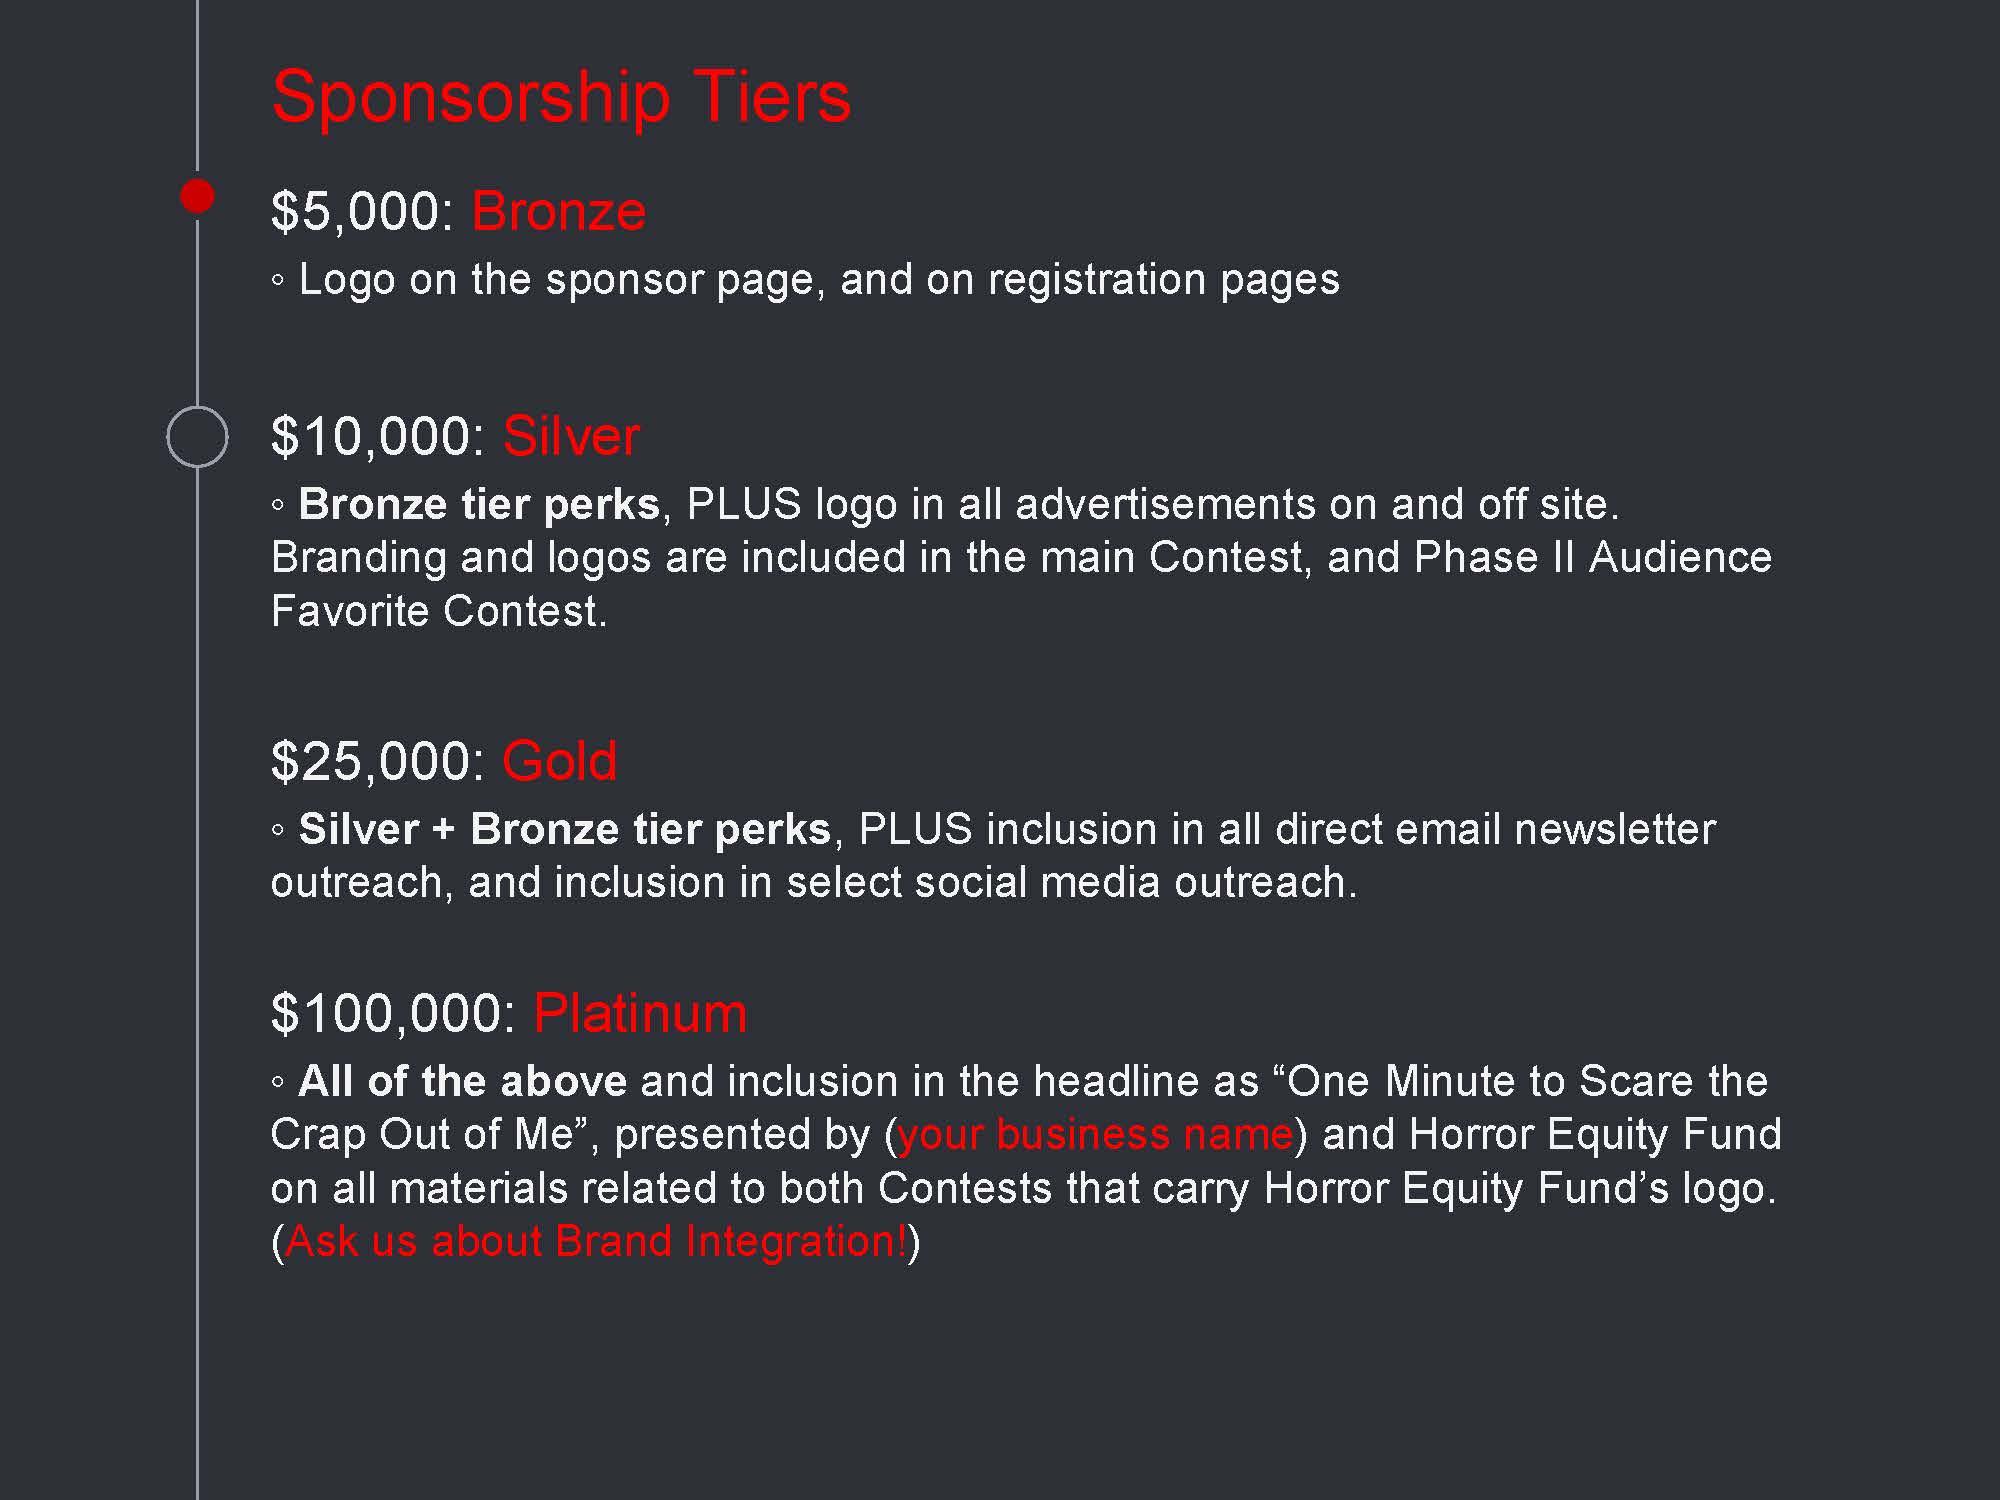 REVISED V20 -HorrorEquityFund 1 Min Sponsor Pitch Deck FINAL JPG 2017_Page_19.jpg